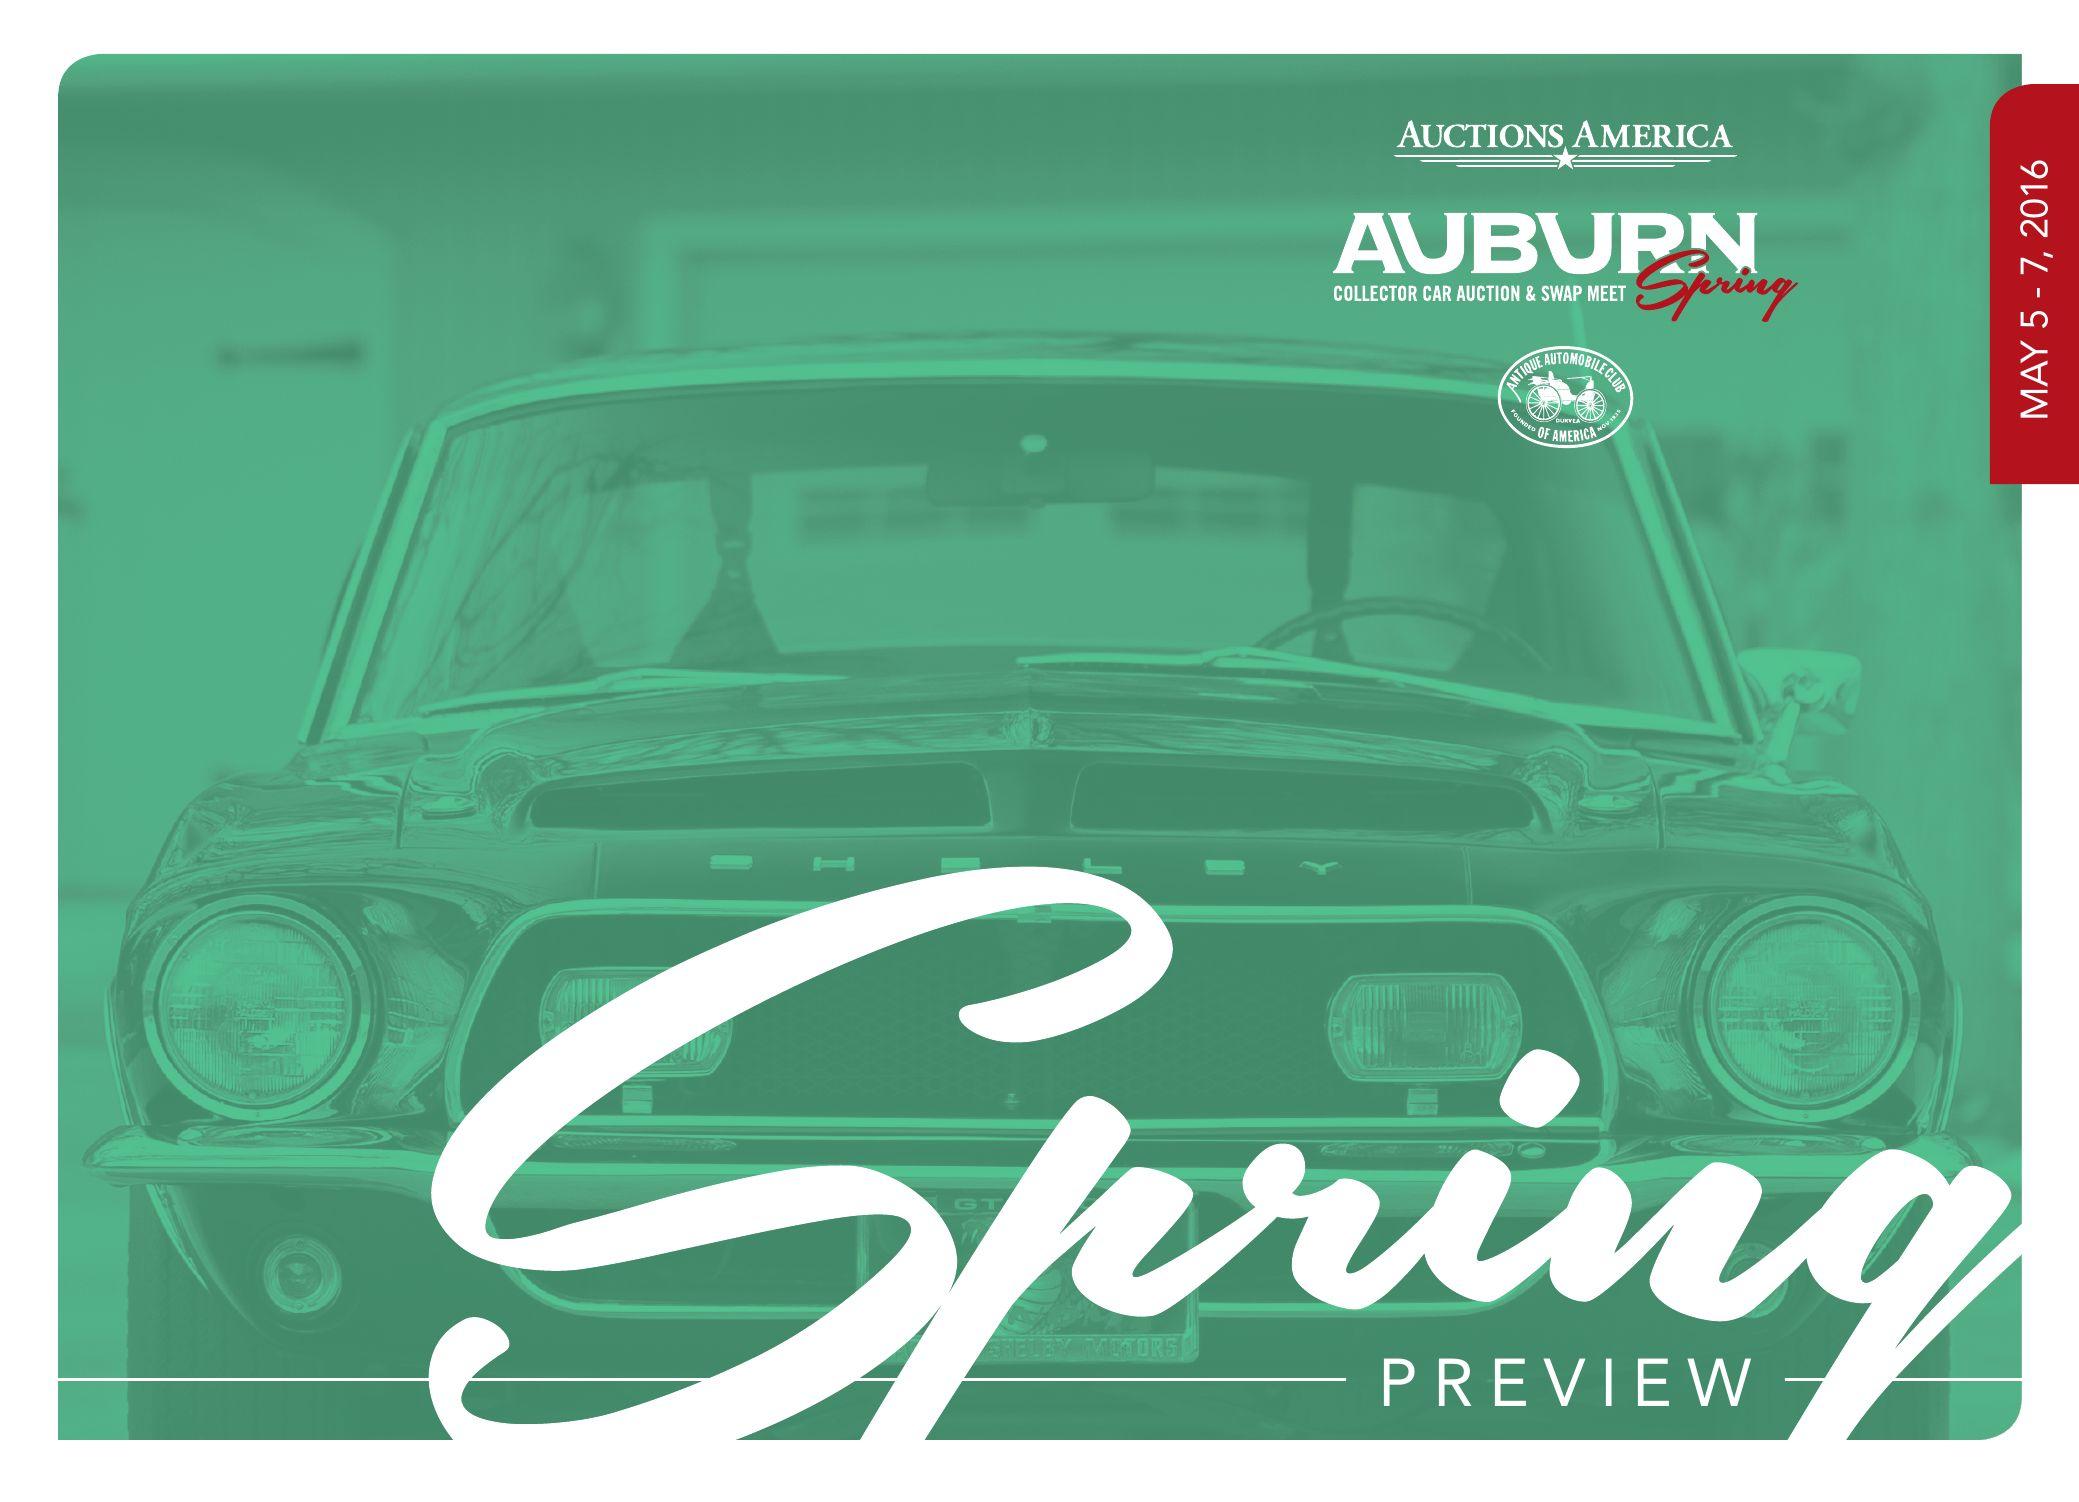 Auburn Spring, 2016